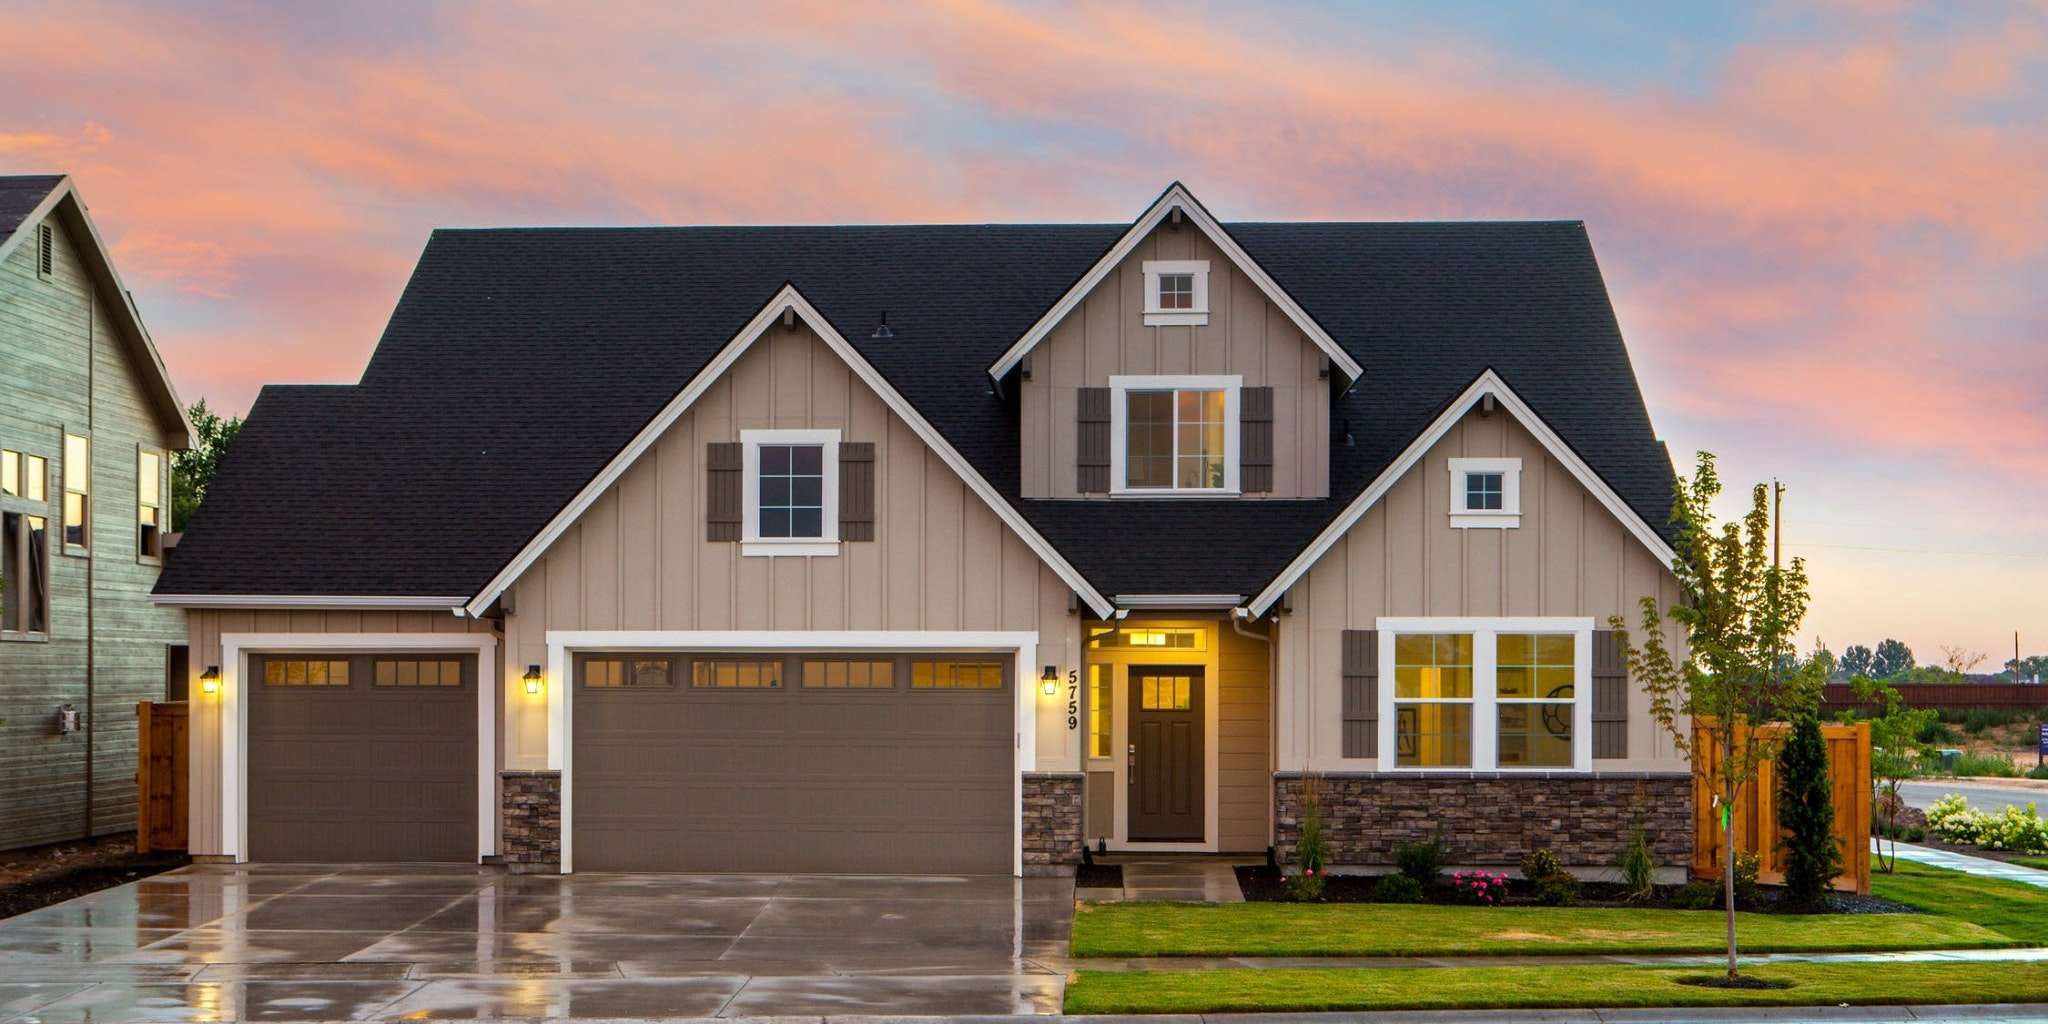 Key Real Estate Group, LLC